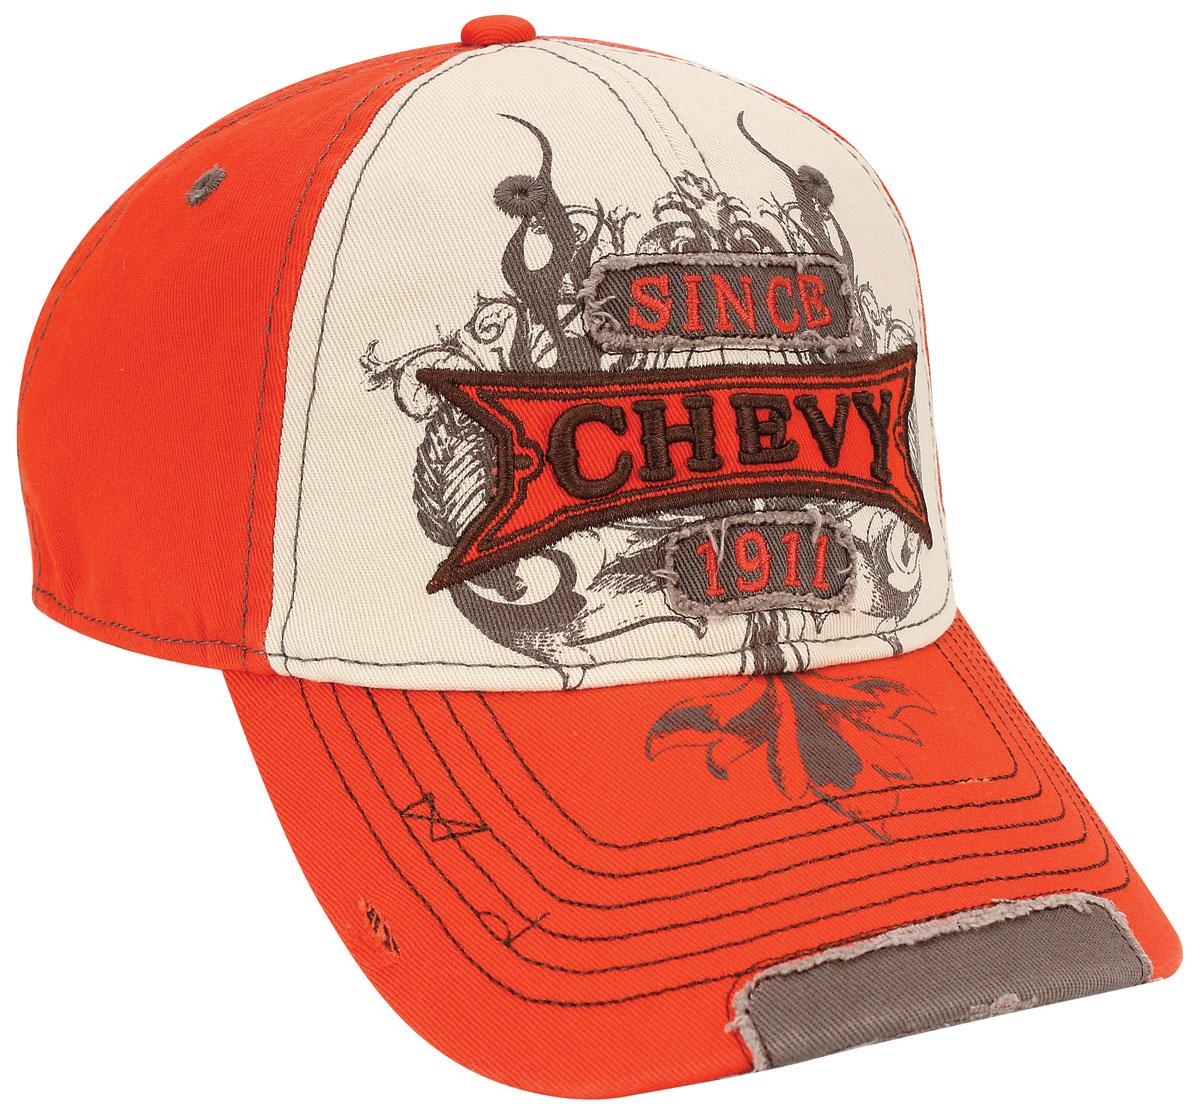 Photo of Chevy Turmoil Hat